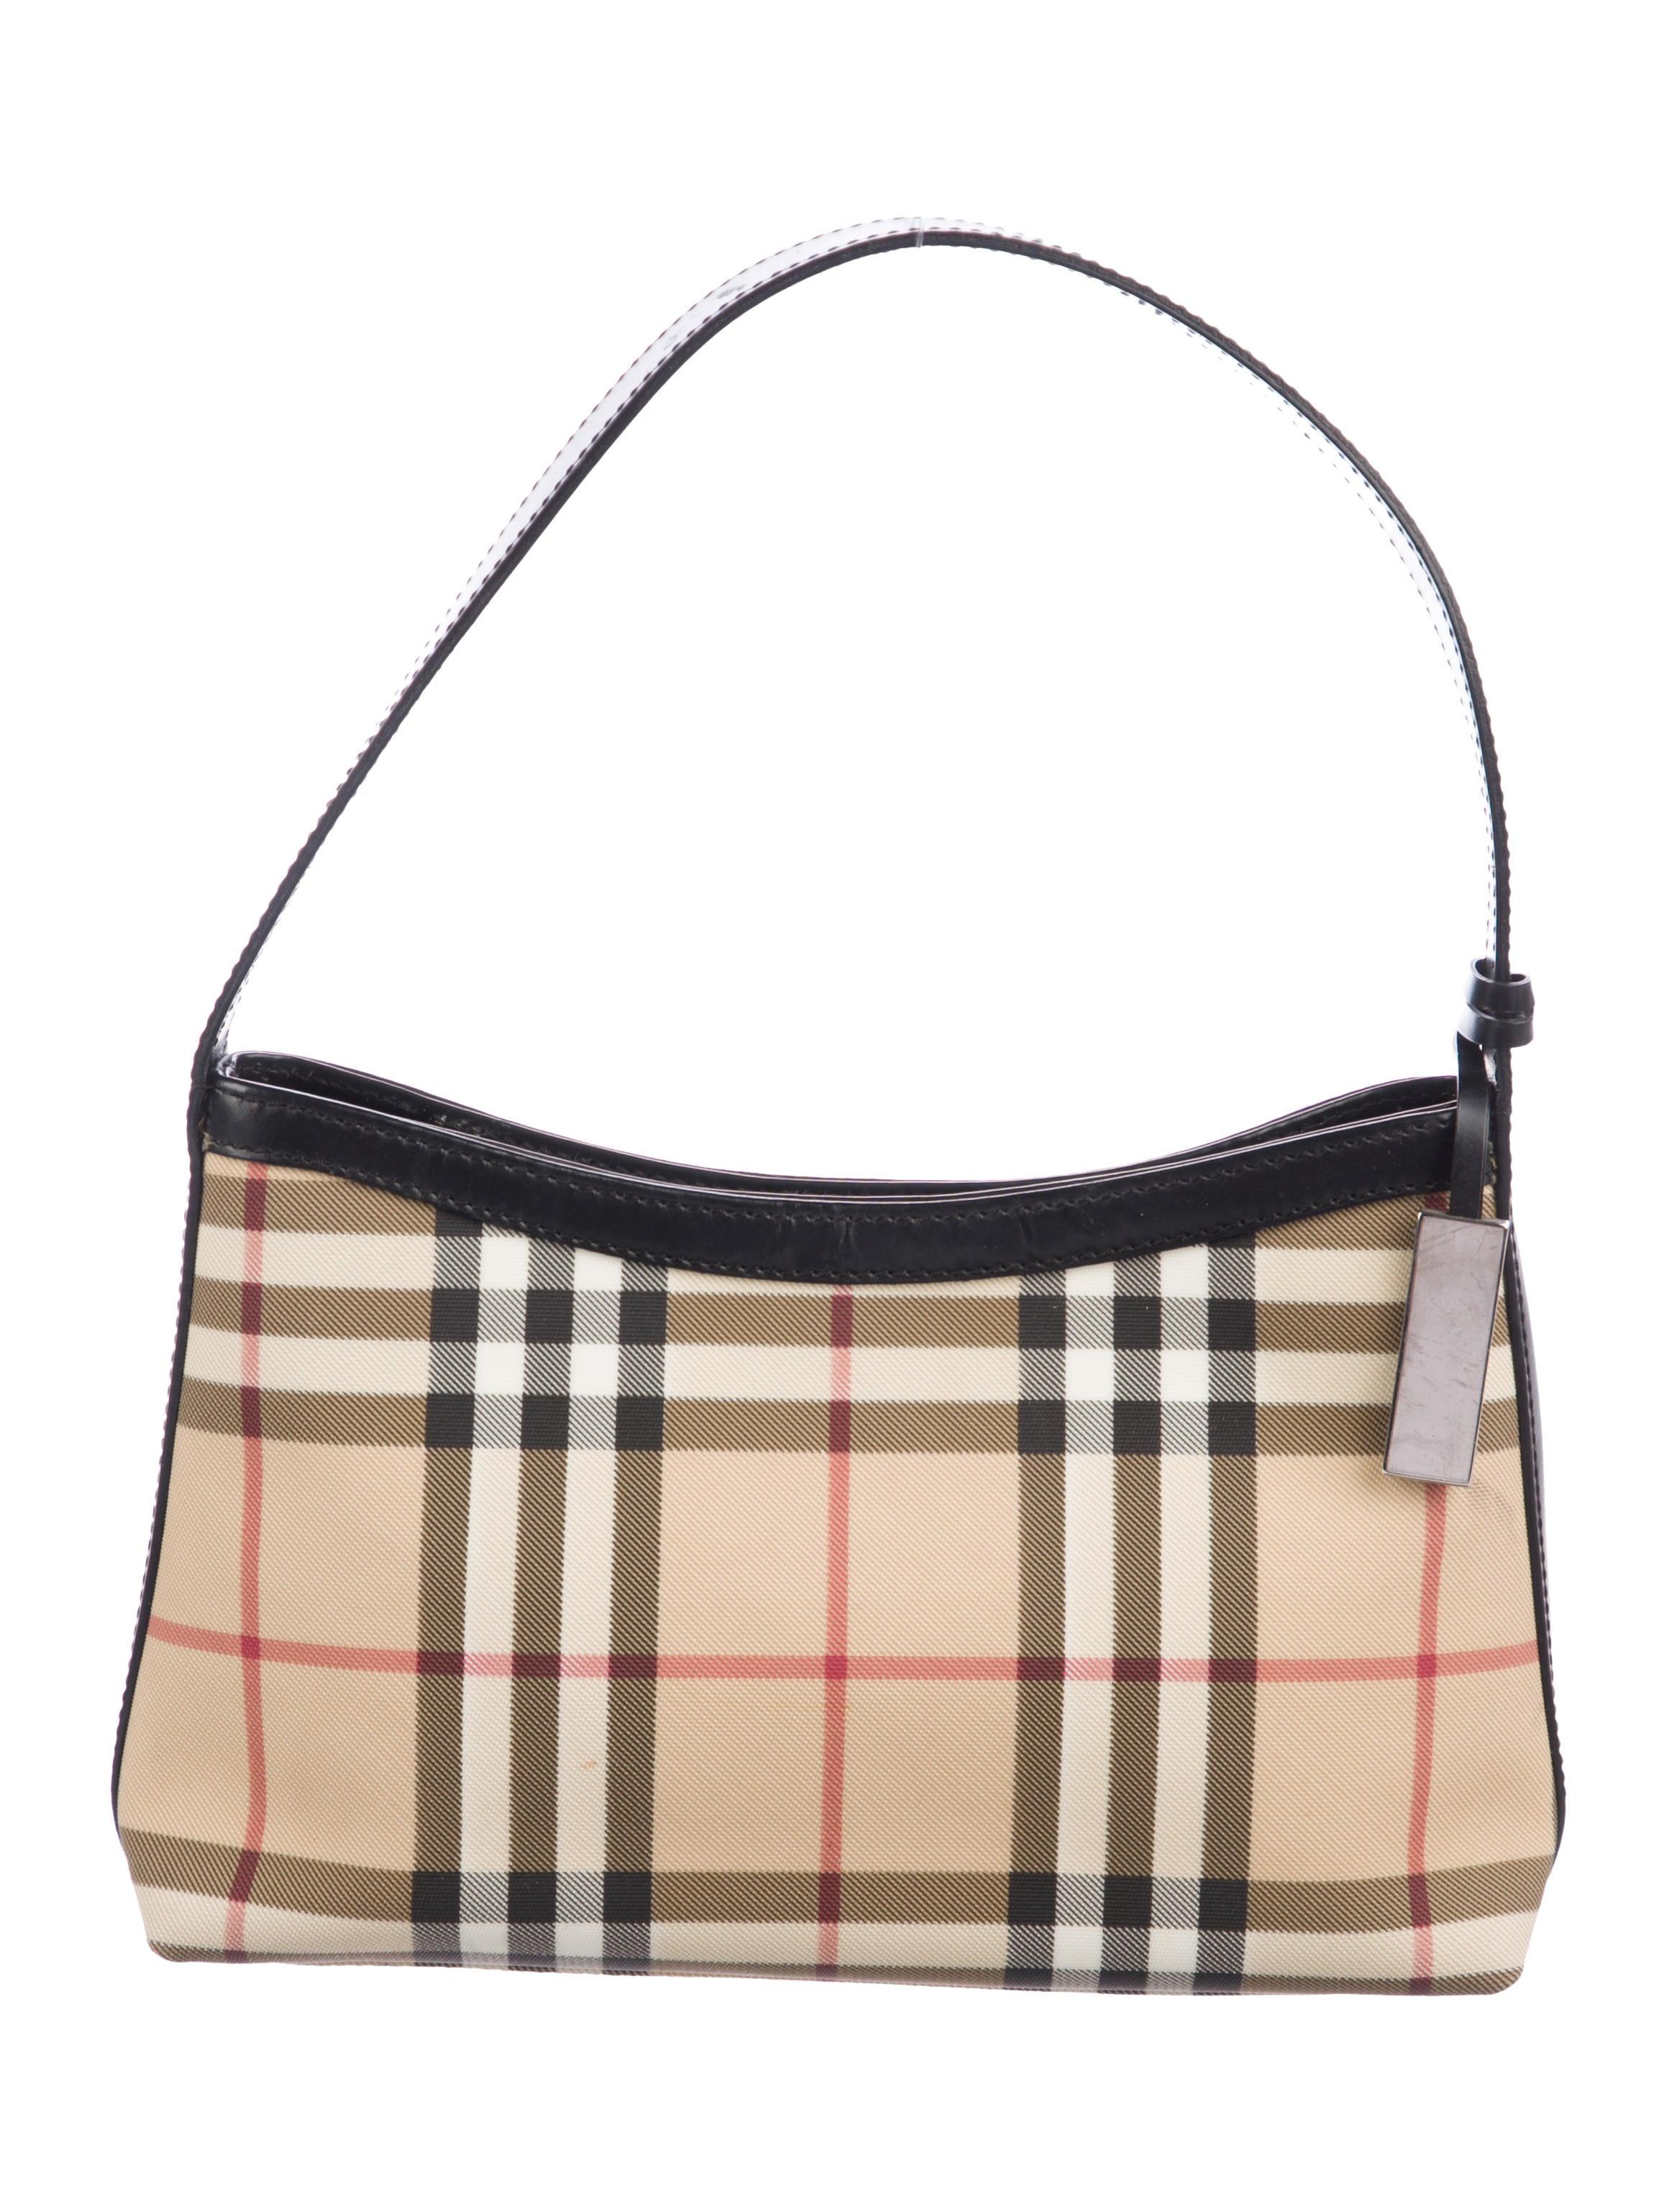 bf46bb64925d Burberry London Nova Check Mini Bag - Handbags - WBURL41628